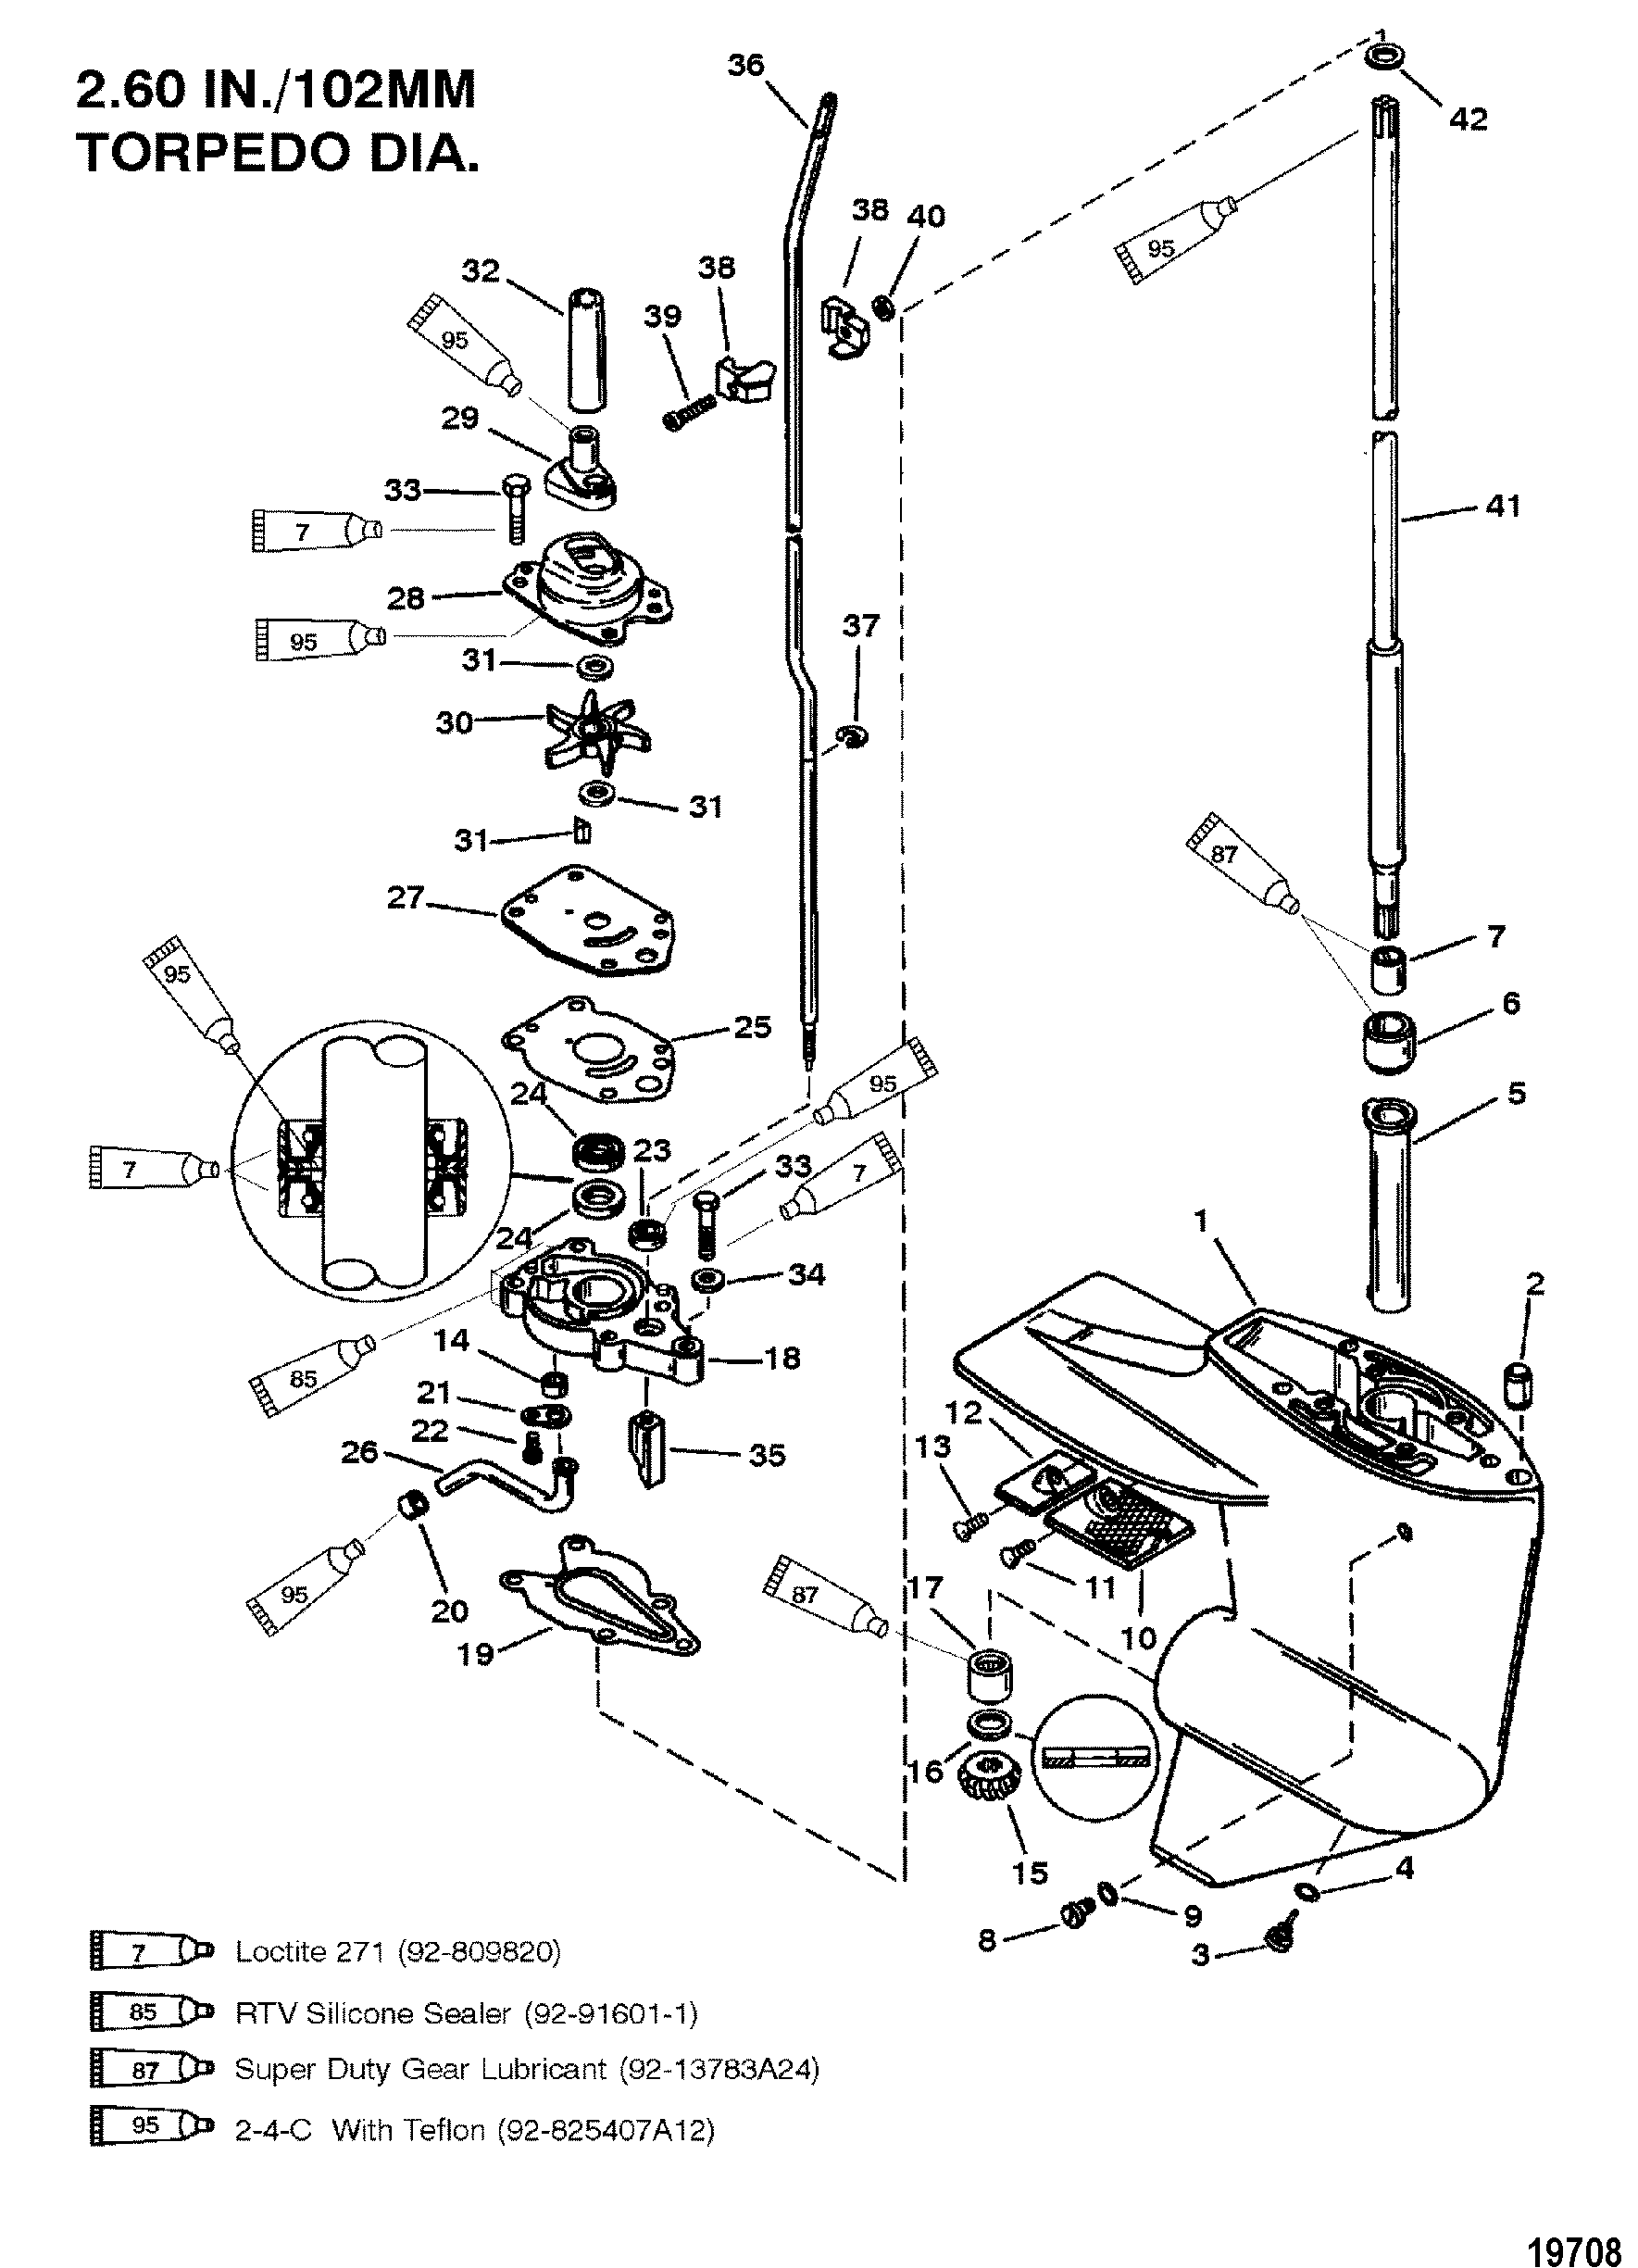 diagram of p.8 mercury motor gear housing driveshaft 2 00 1 gear ratio for mariner  gear housing driveshaft 2 00 1 gear ratio for mariner